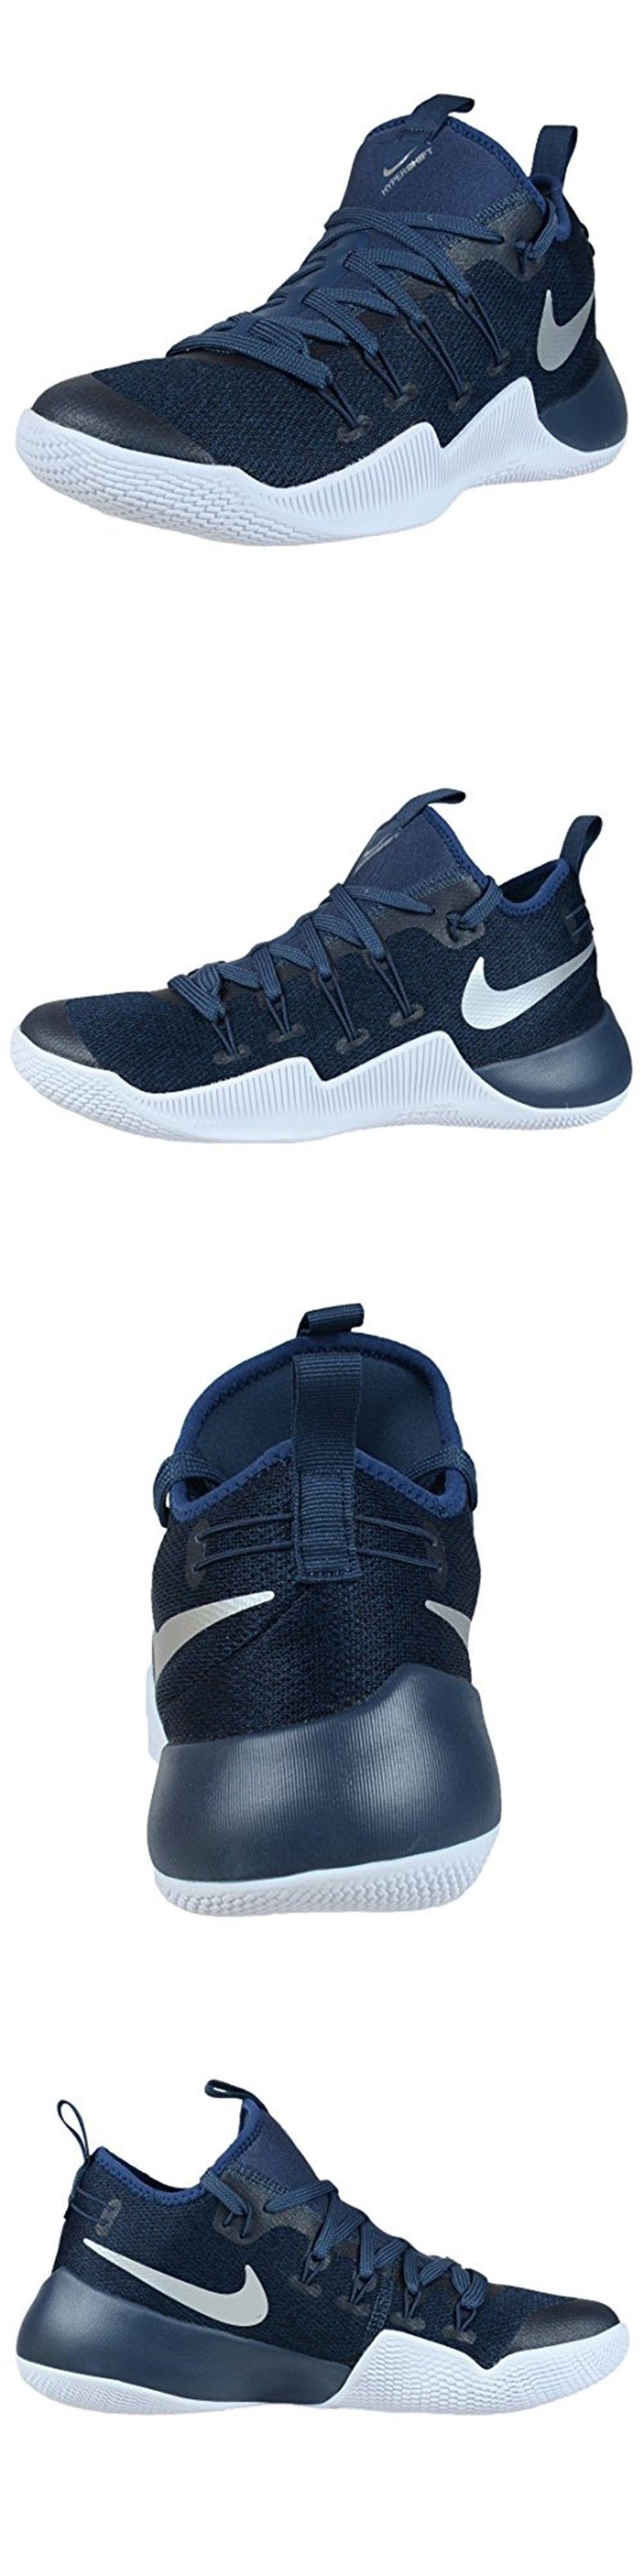 Men 158971  Nike Men S Hypershift Basketball Shoes 844369 410 Blue Metallic  Silver Size 11 a2e7e518a